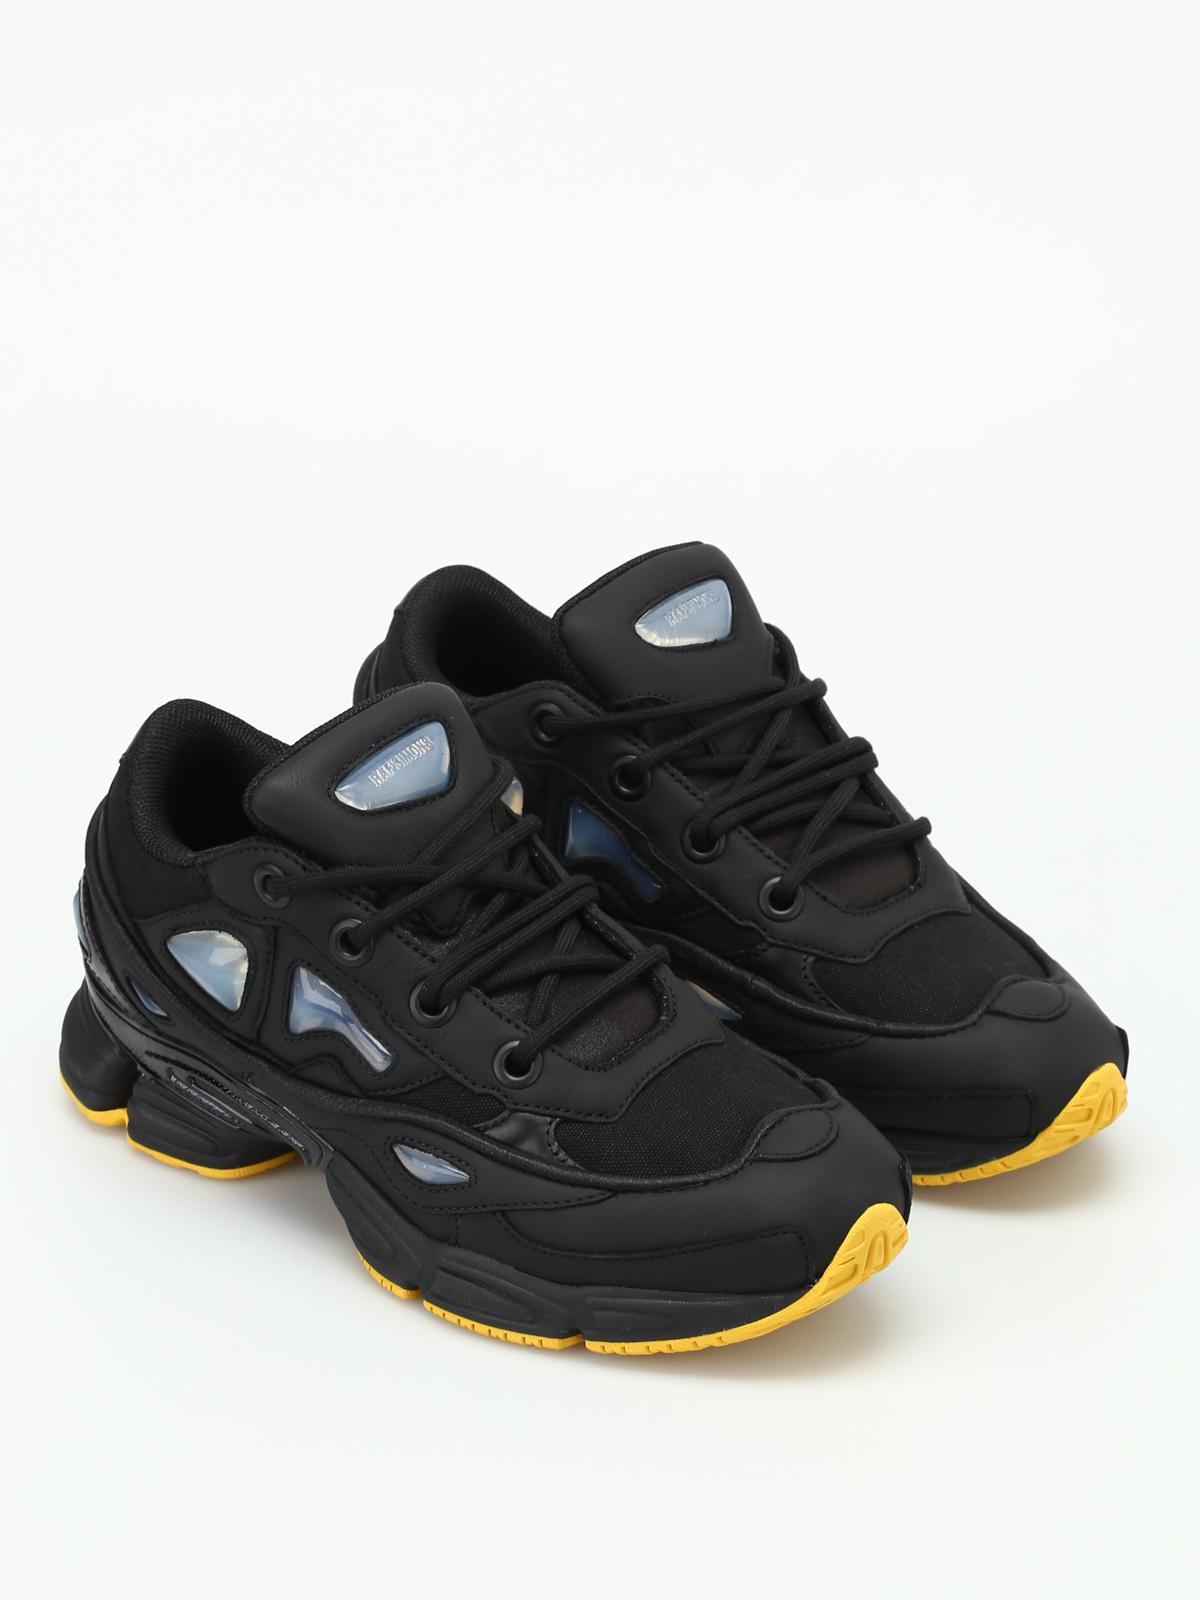 RAF SIMONS ADIDAS  trainers online - Ozweego III running shoes 11add0073